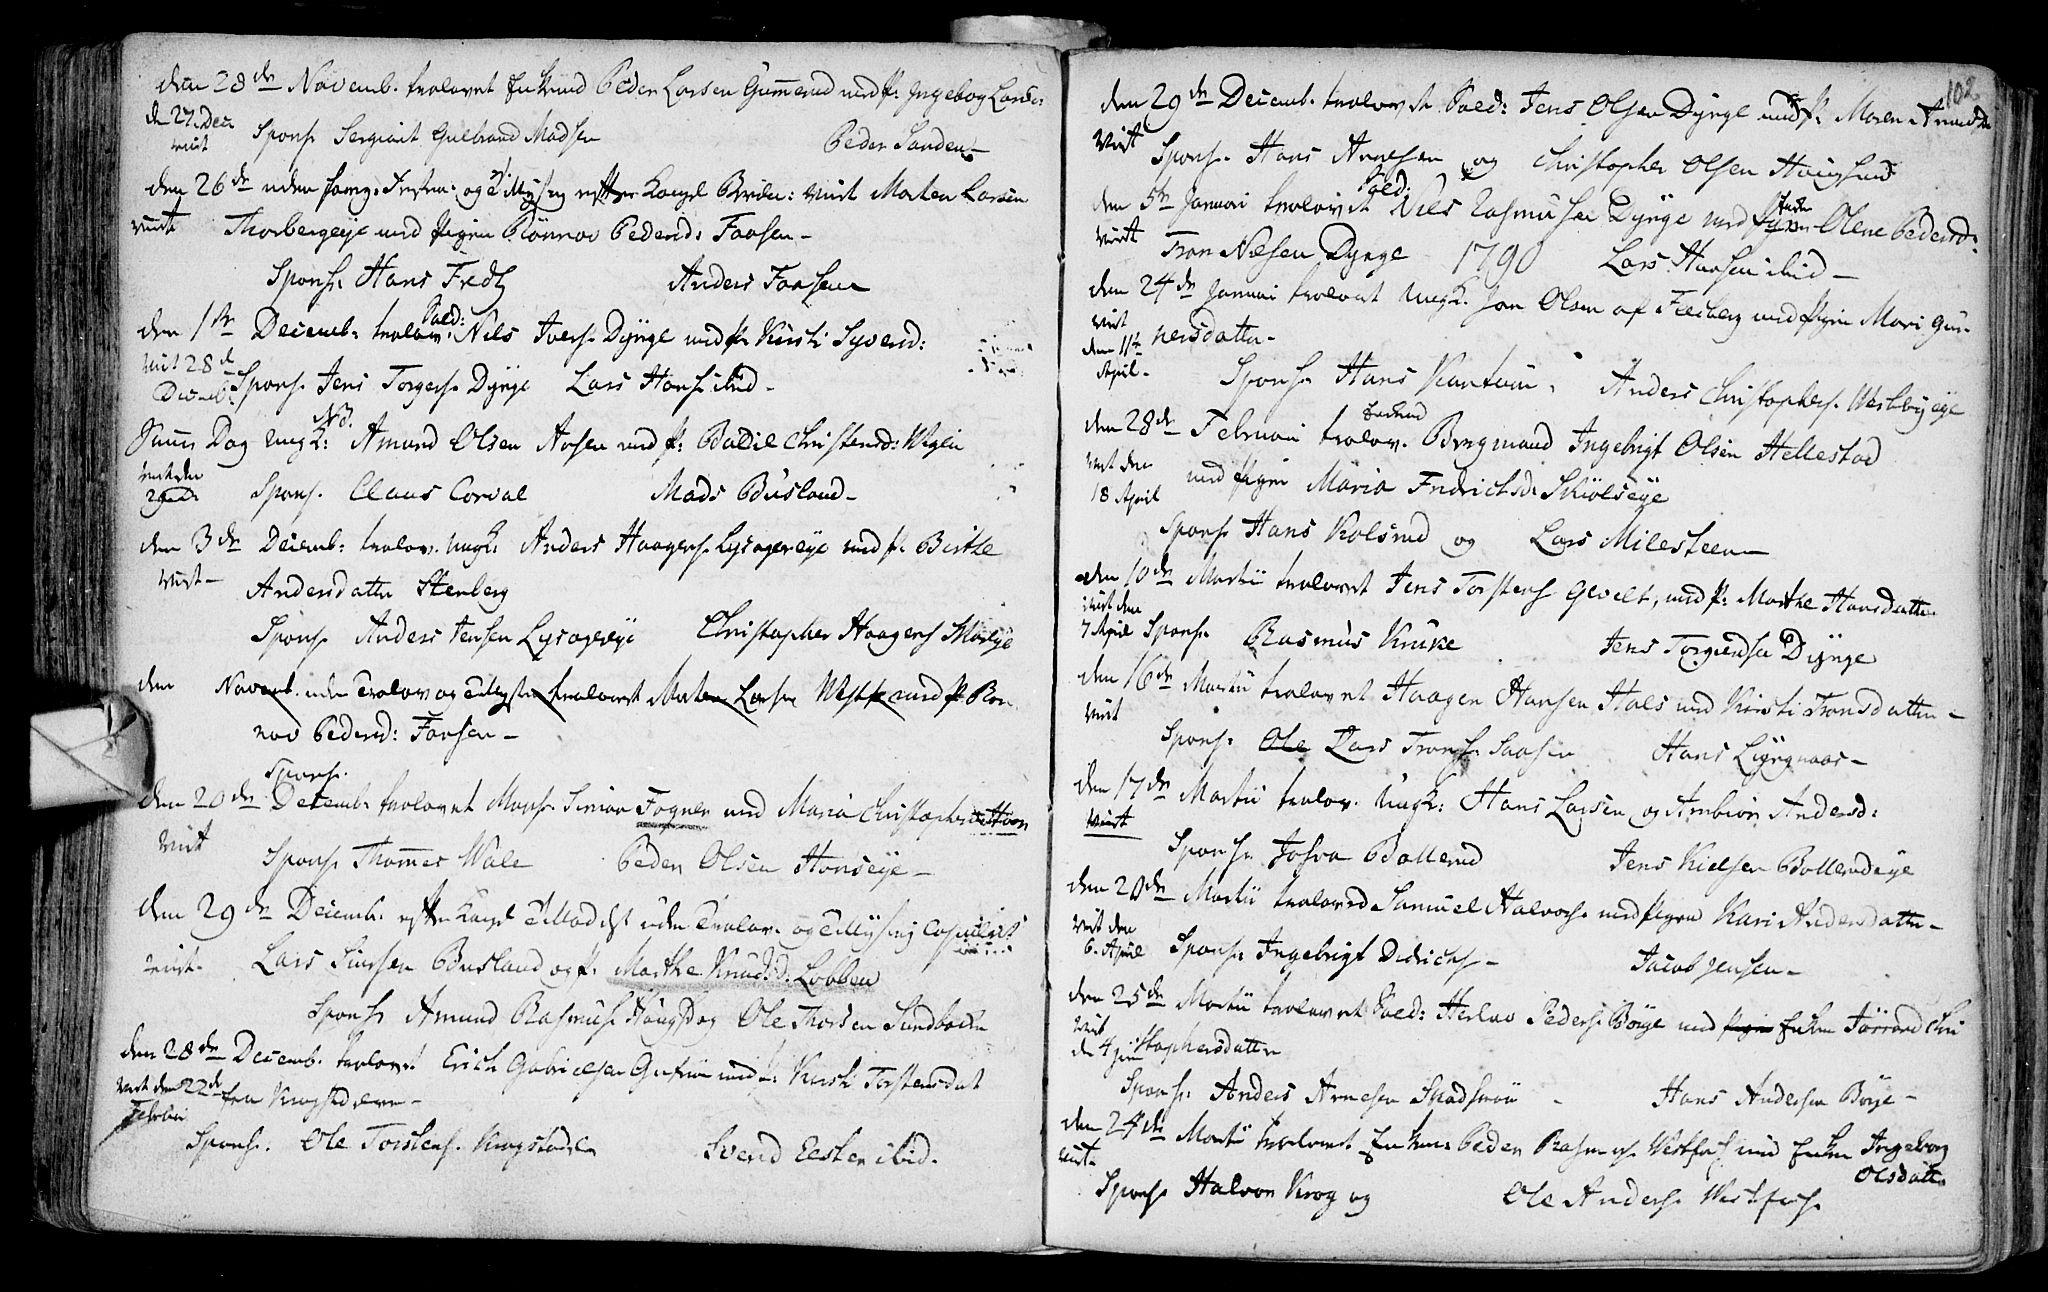 SAKO, Eiker kirkebøker, F/Fa/L0007: Ministerialbok nr. I 7 /1, 1733-1808, s. 102